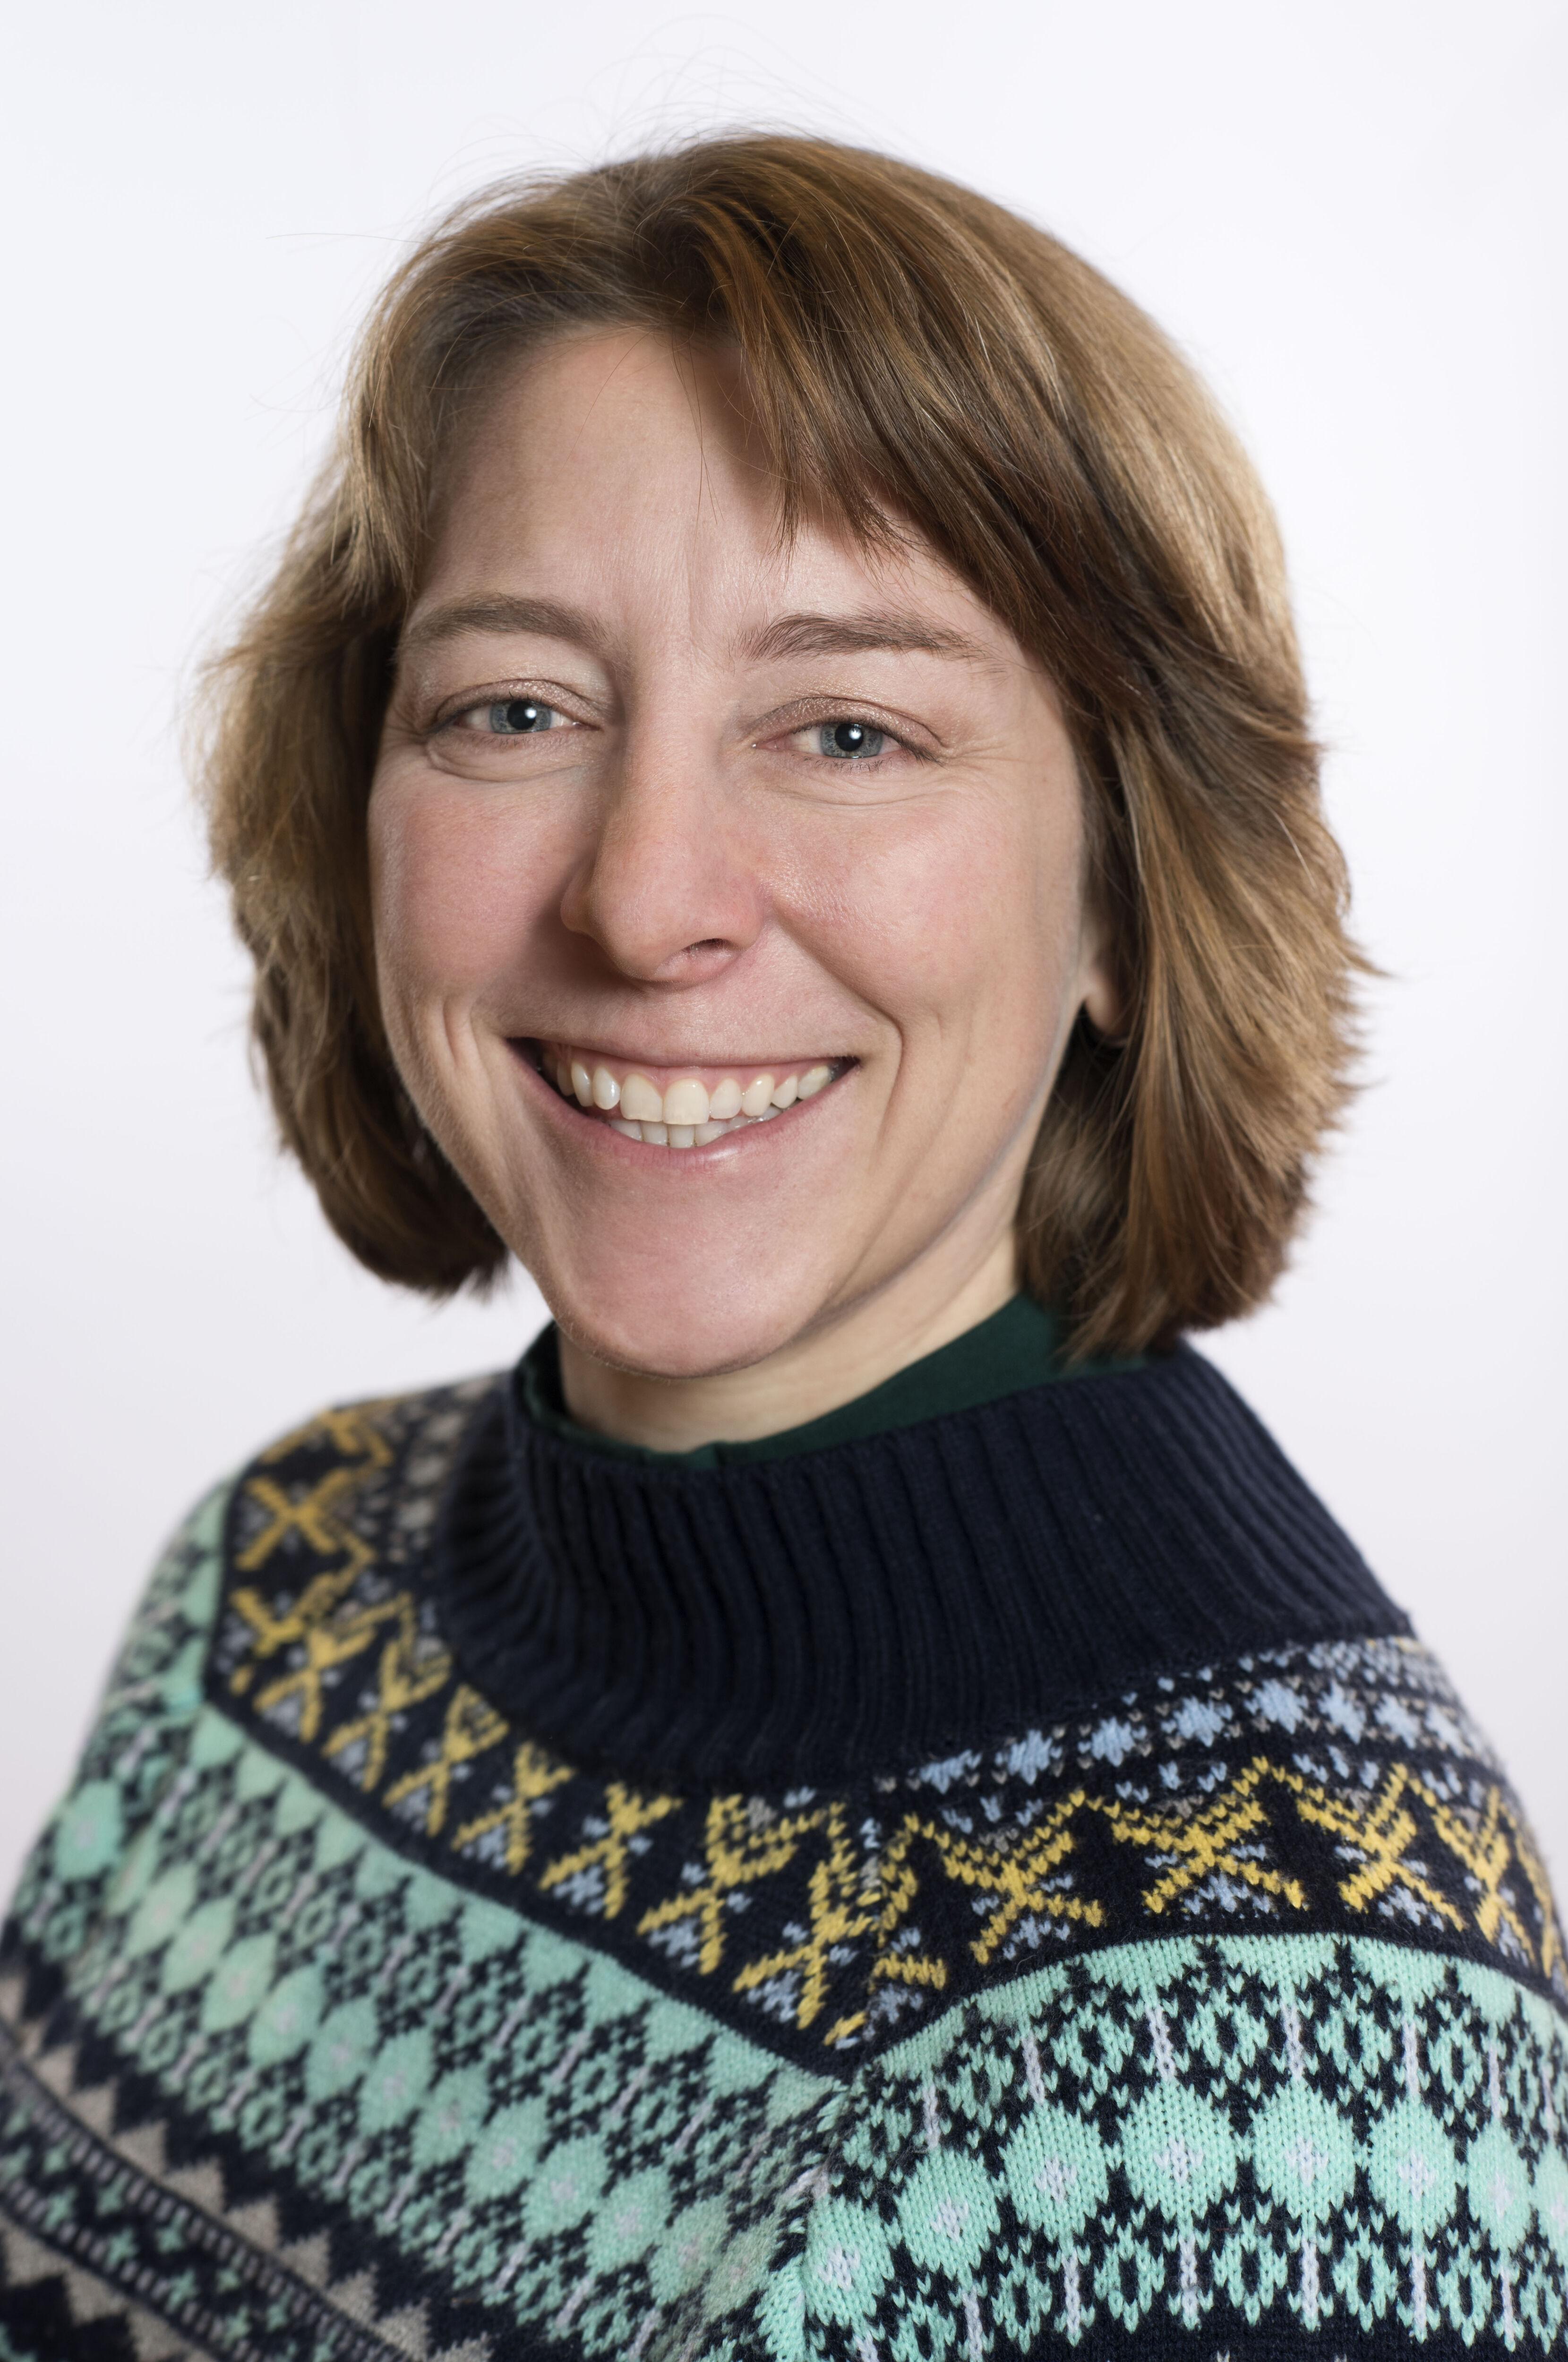 Rachael Hagerstrom